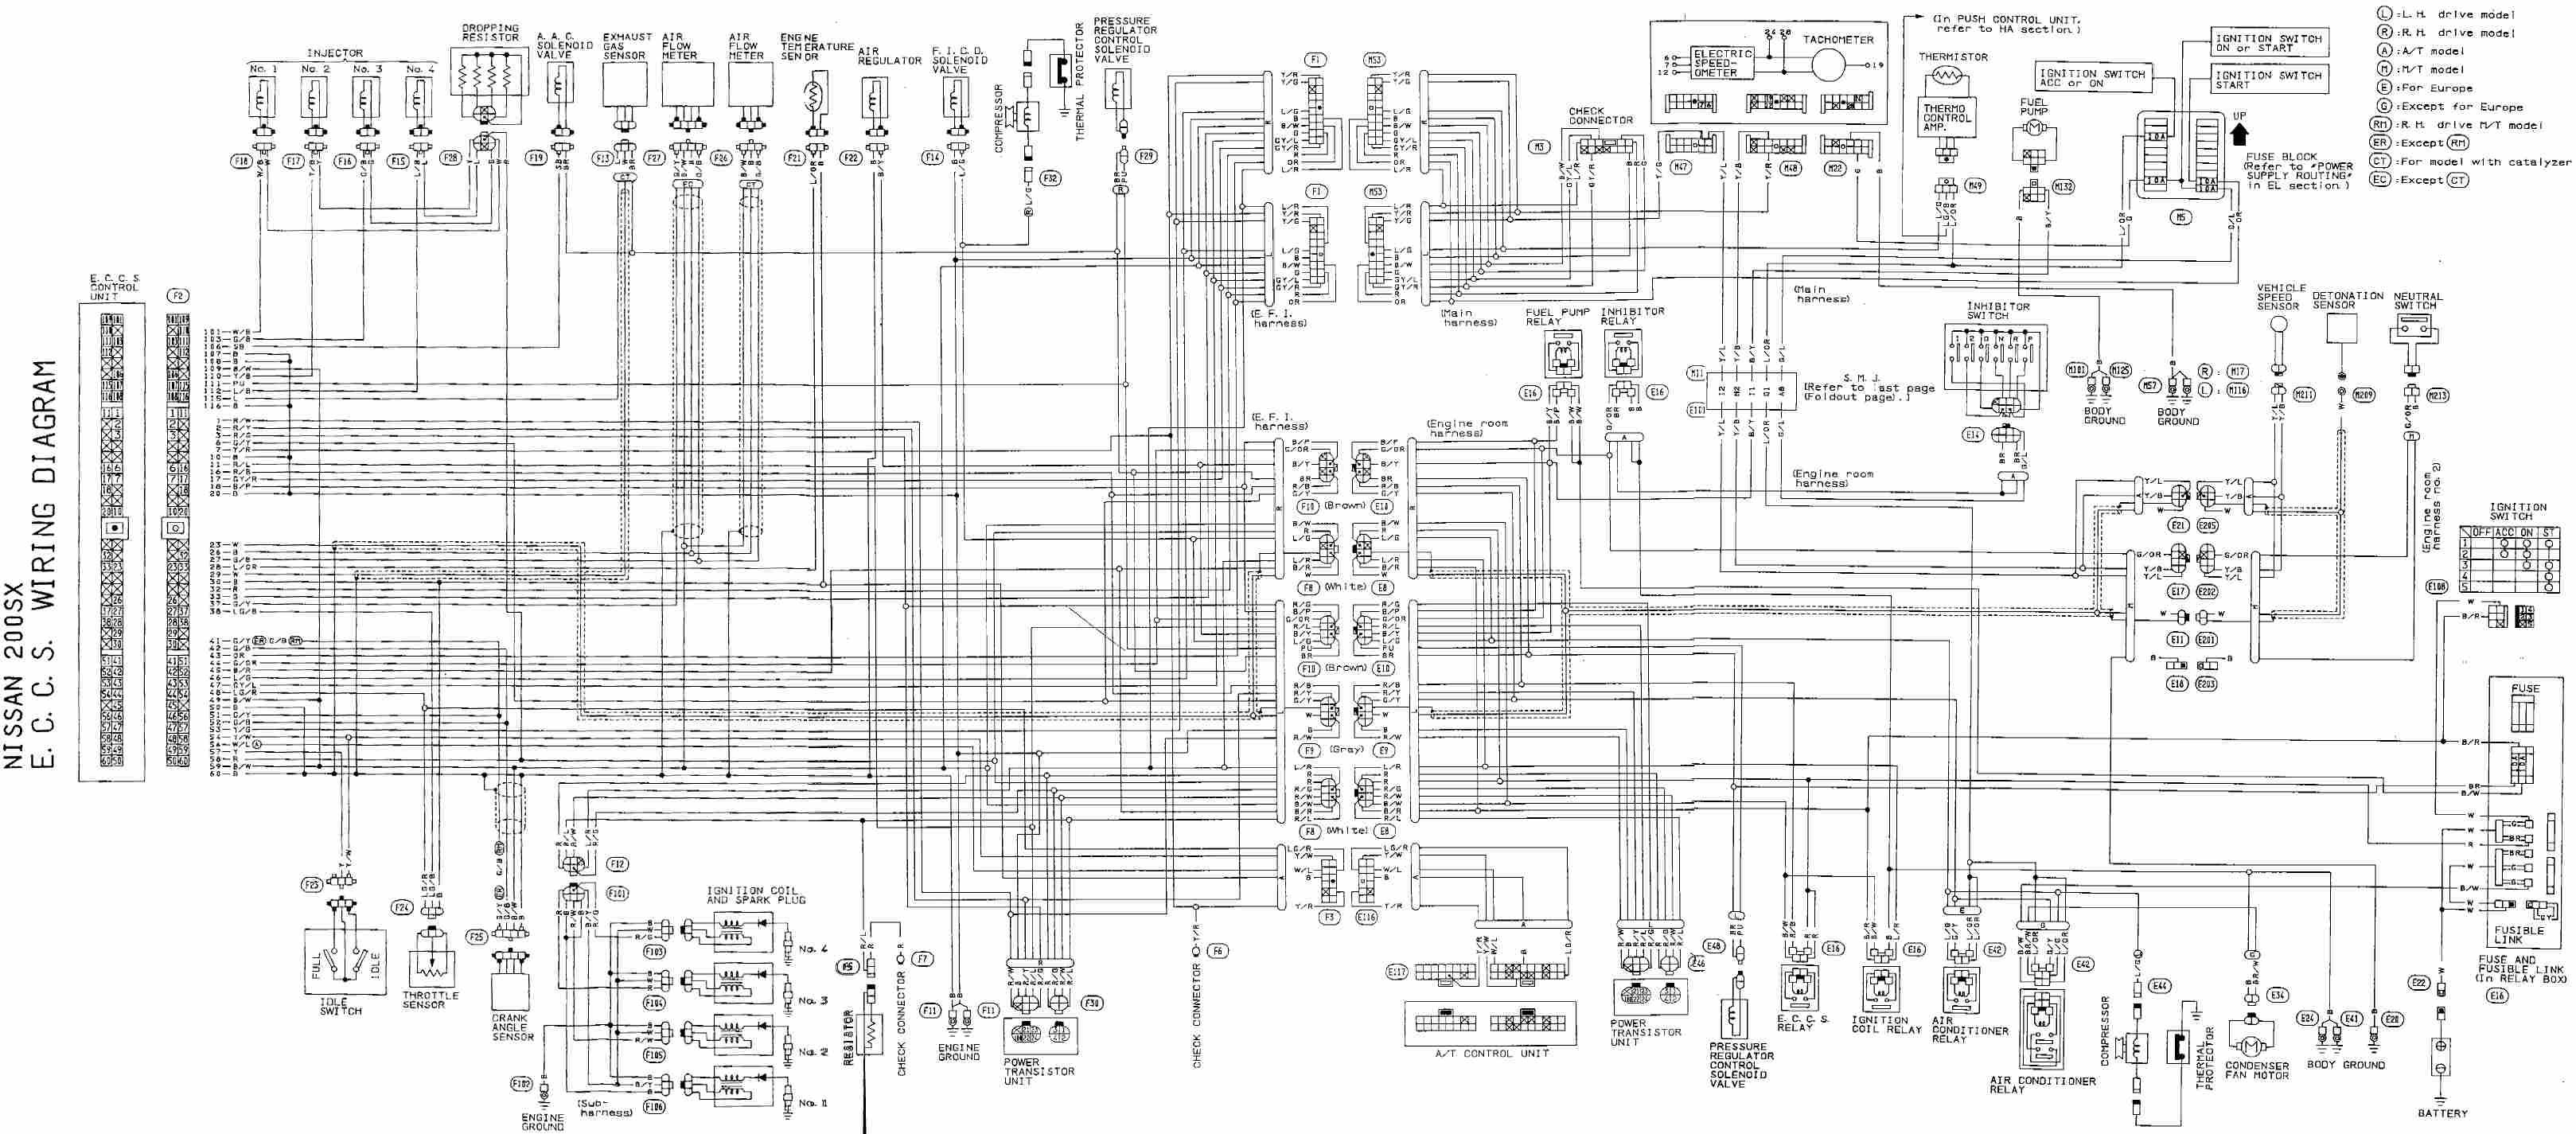 nissan atlas wiring diagram wiring library 1987 nissan wiring schematics nissan wiring schematics [ 3237 x 1425 Pixel ]